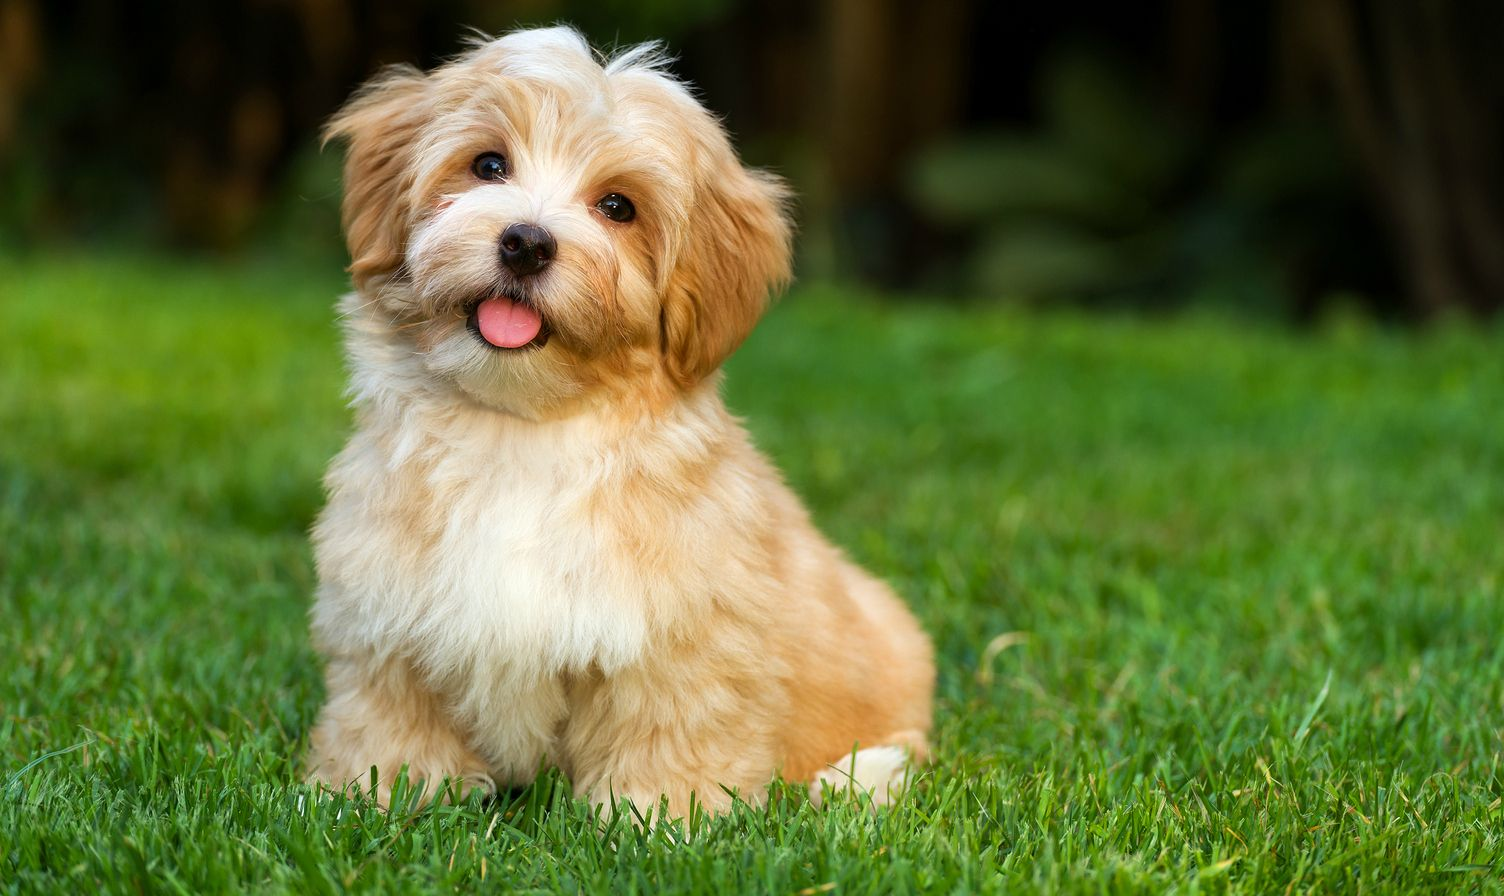 CT Breeder on Havanese puppies, Havanese dogs, Havanese